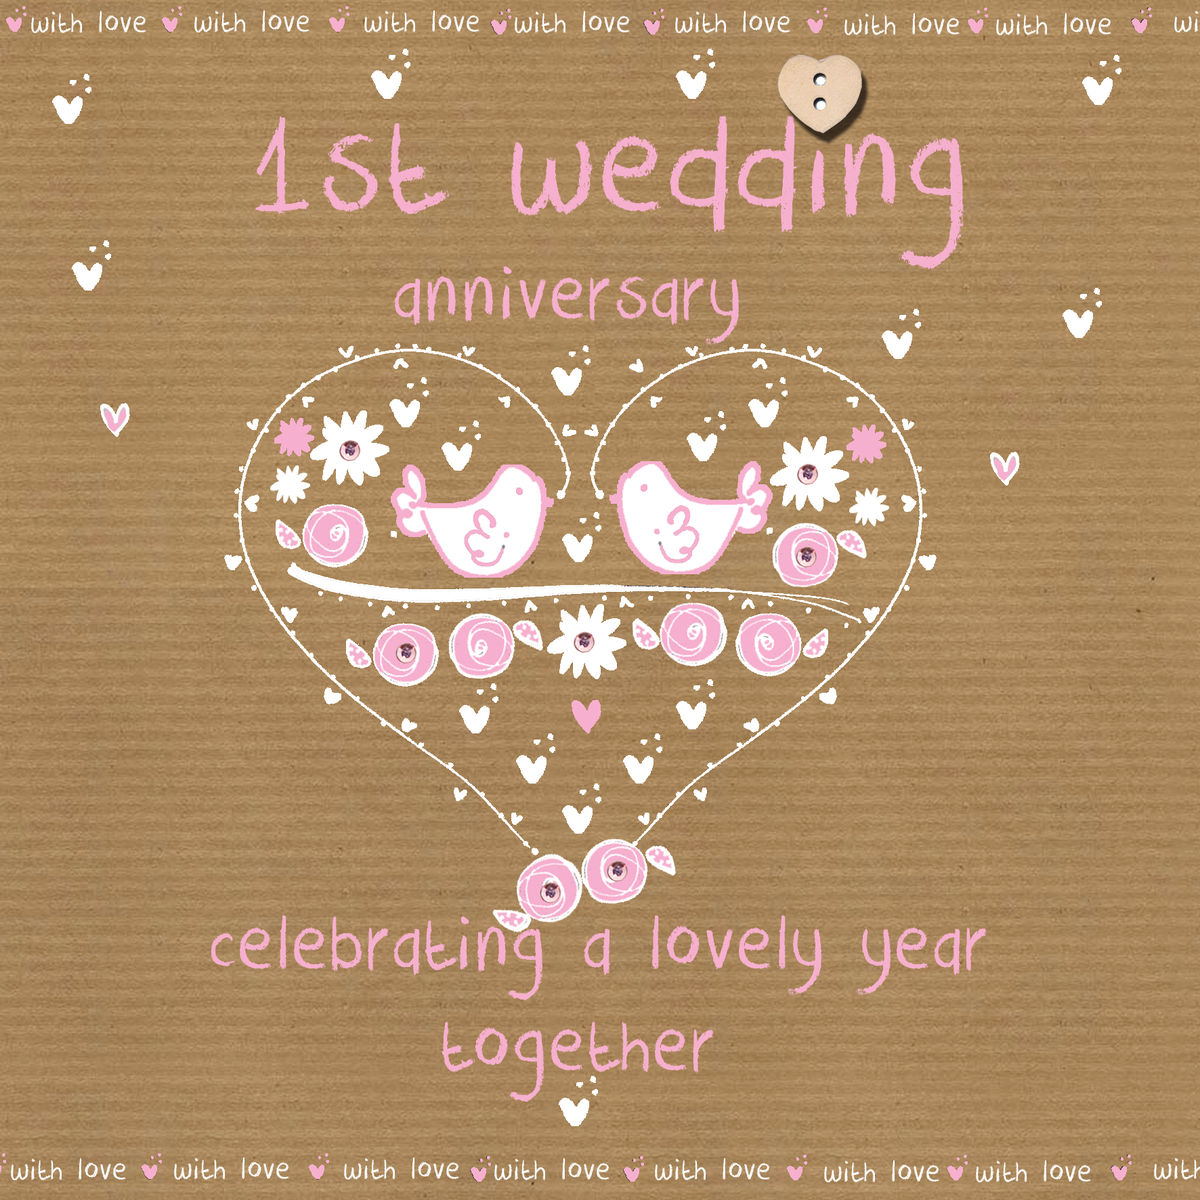 1st Wedding Anniversary Decoration Ideas At Home: First Wedding Anniversary Card